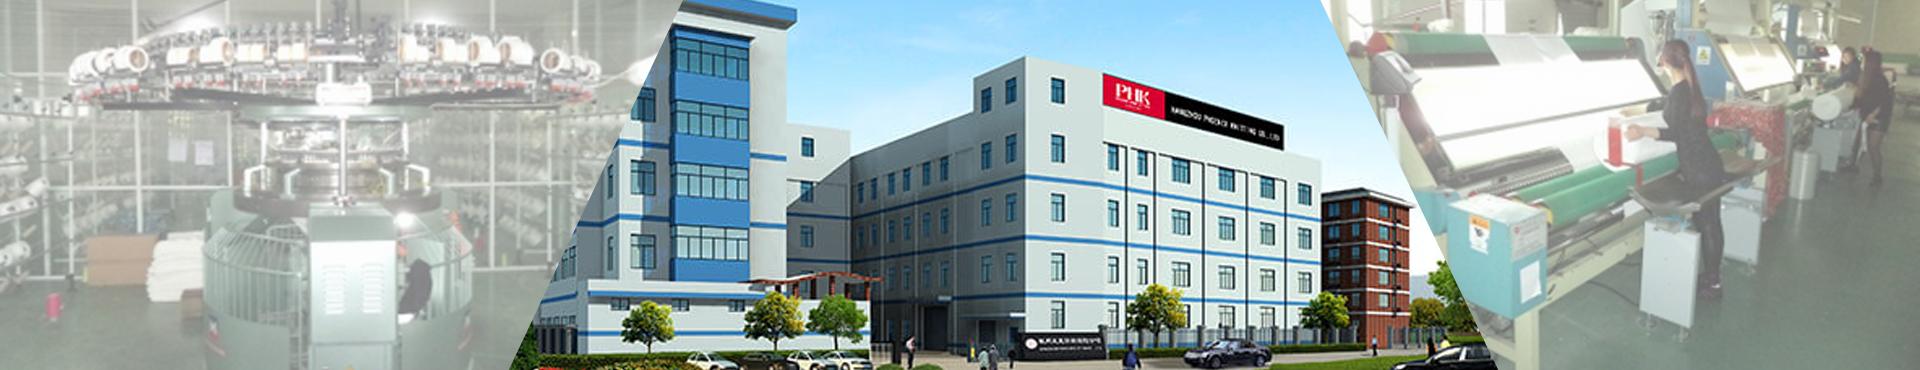 Hangzhou PHK Knitting Co., Ltd.